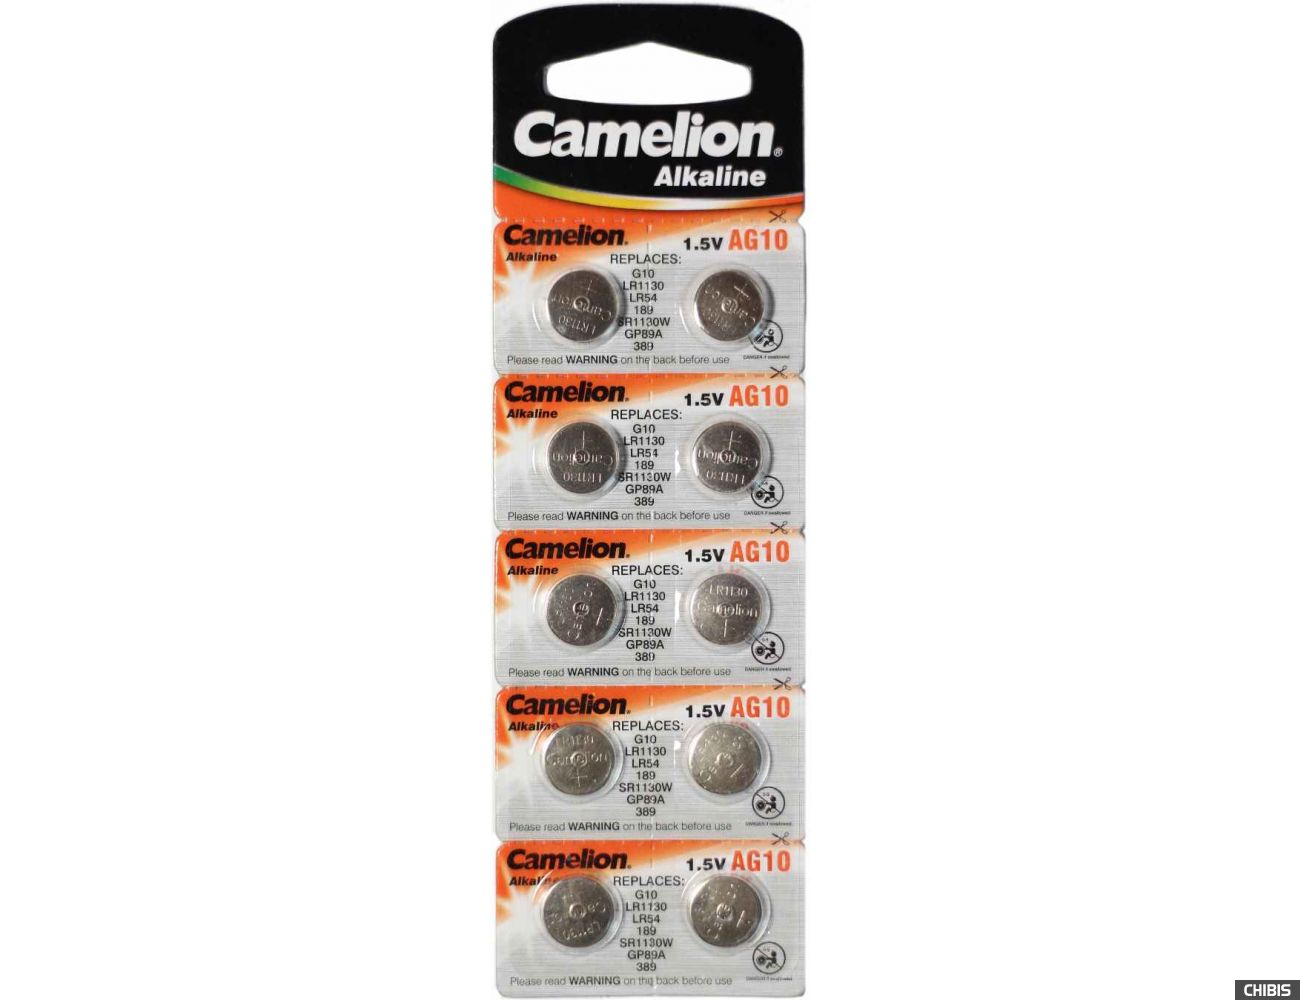 Батарейка Camelion AG10 / LR1130 / LR54 / GP89 / 389 / V10 Alkaline 1.5V 1/10 шт